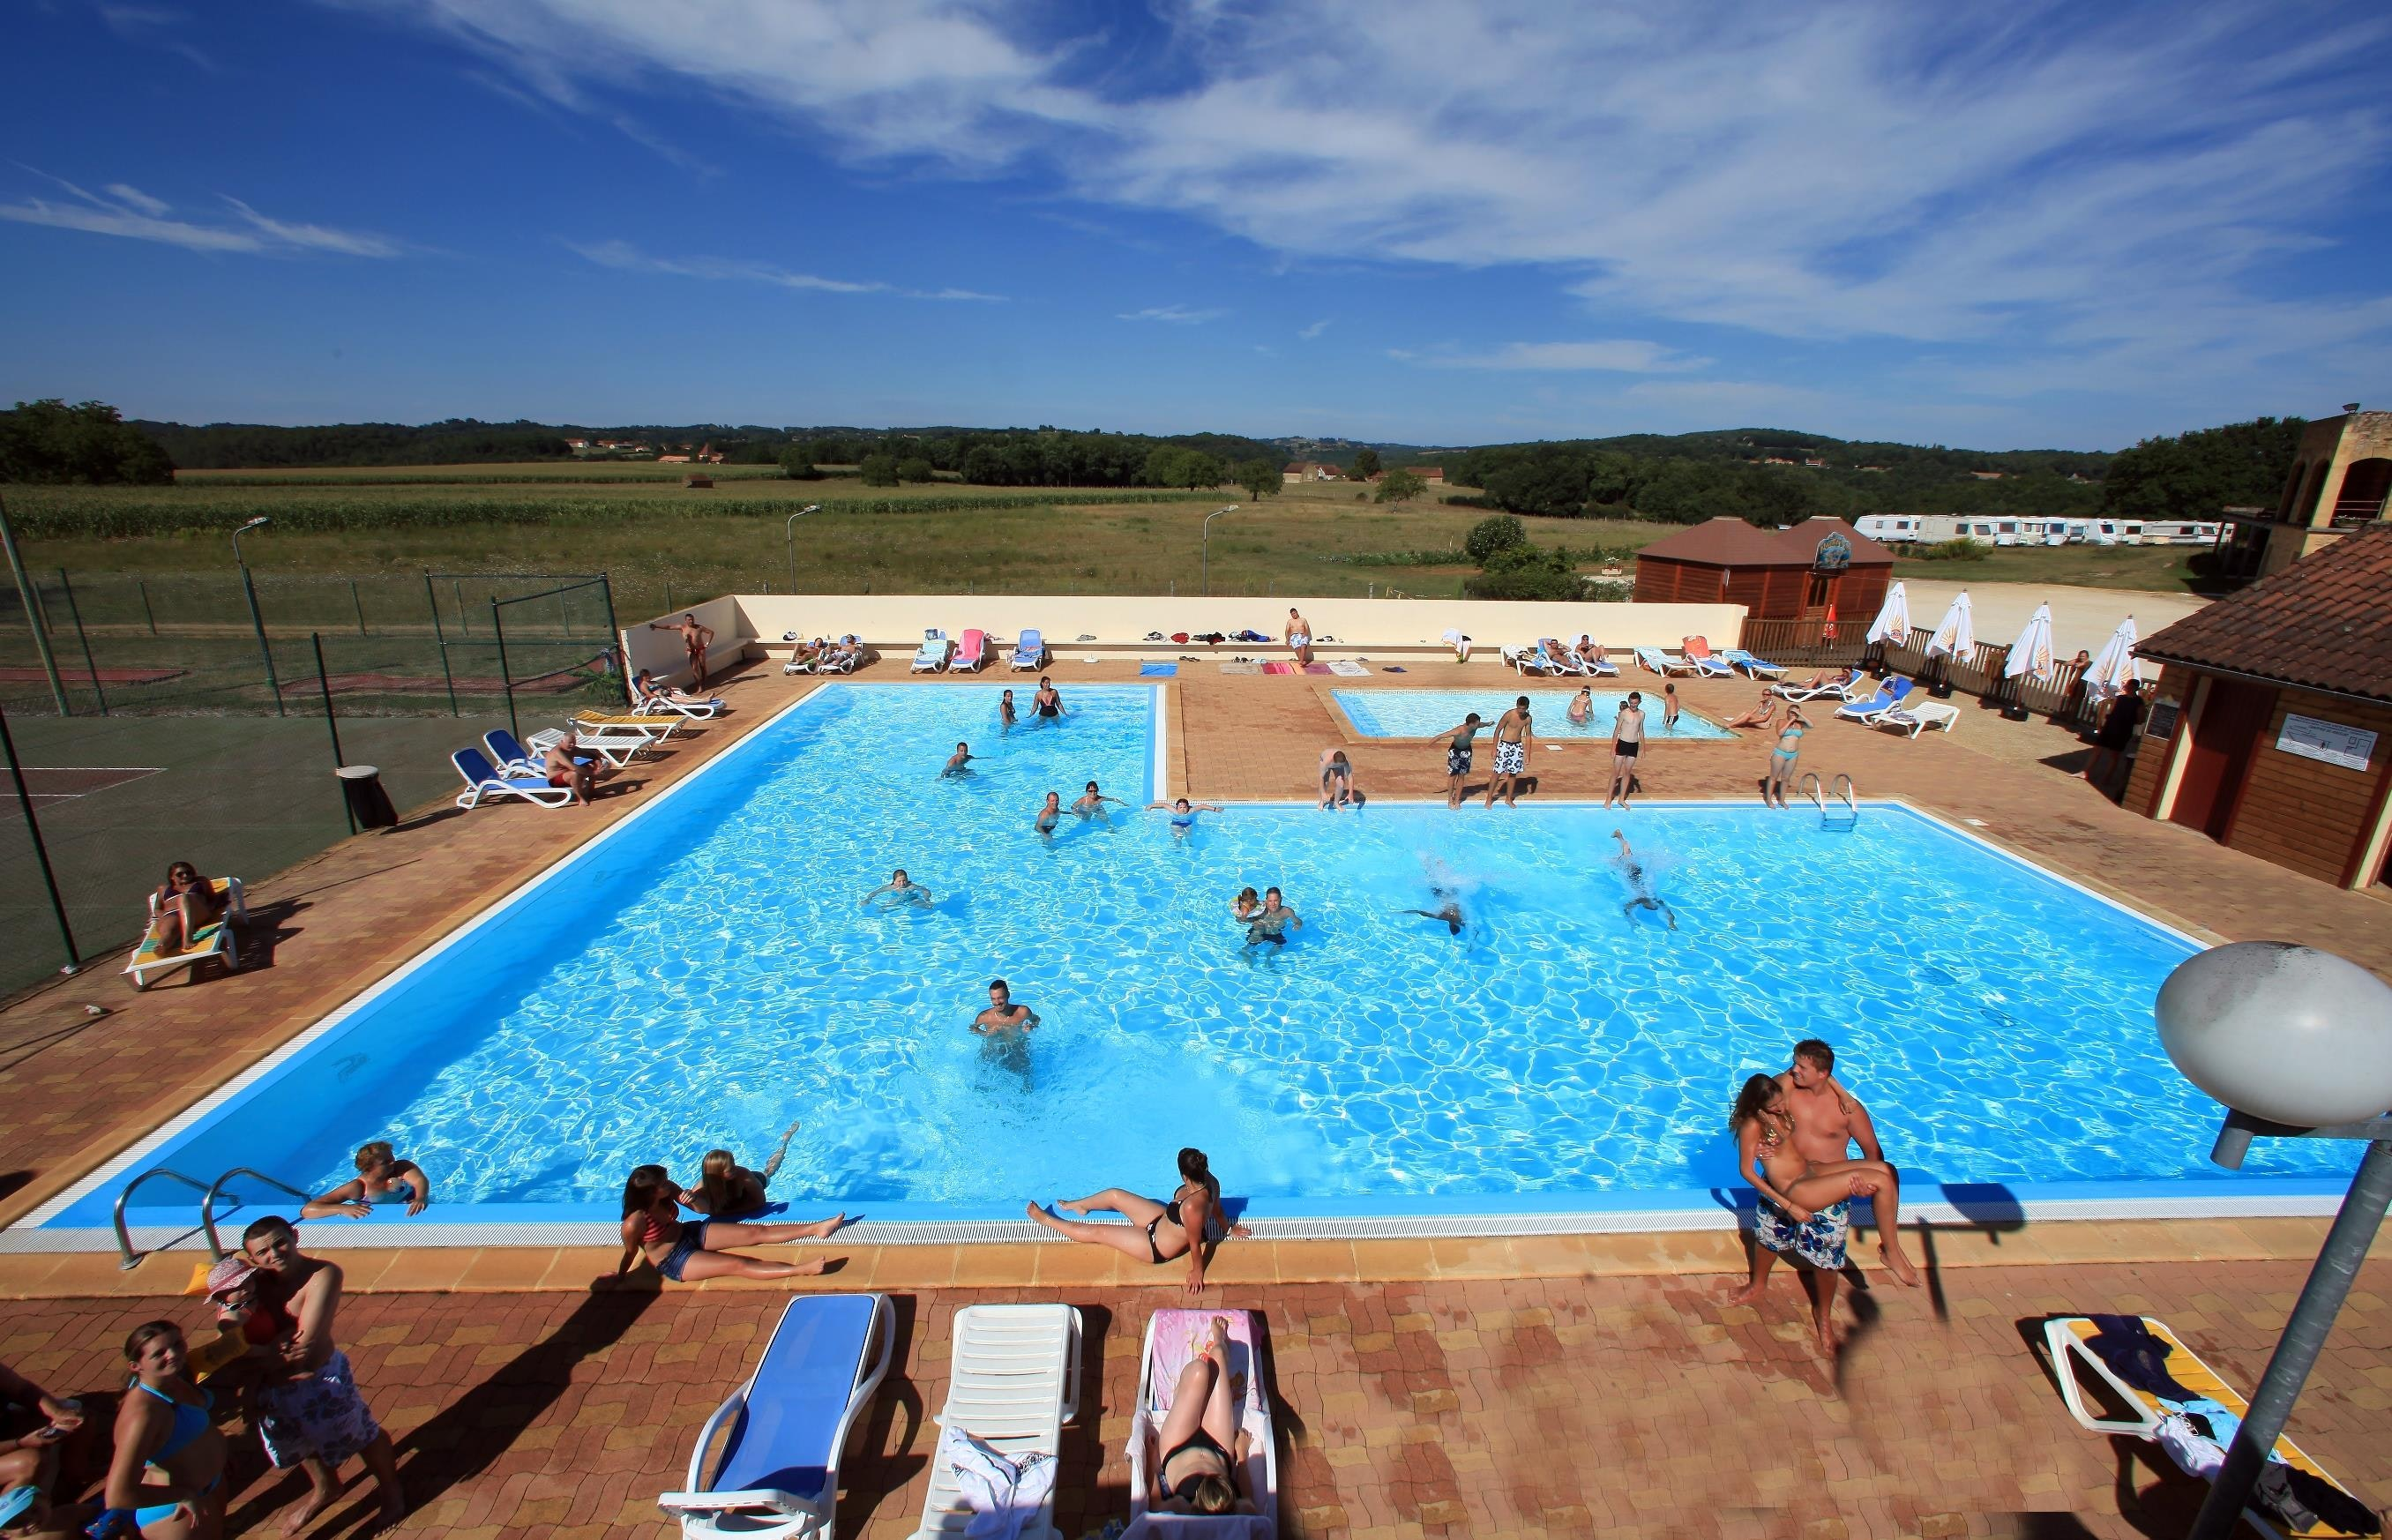 Camping de Maillac zwembad